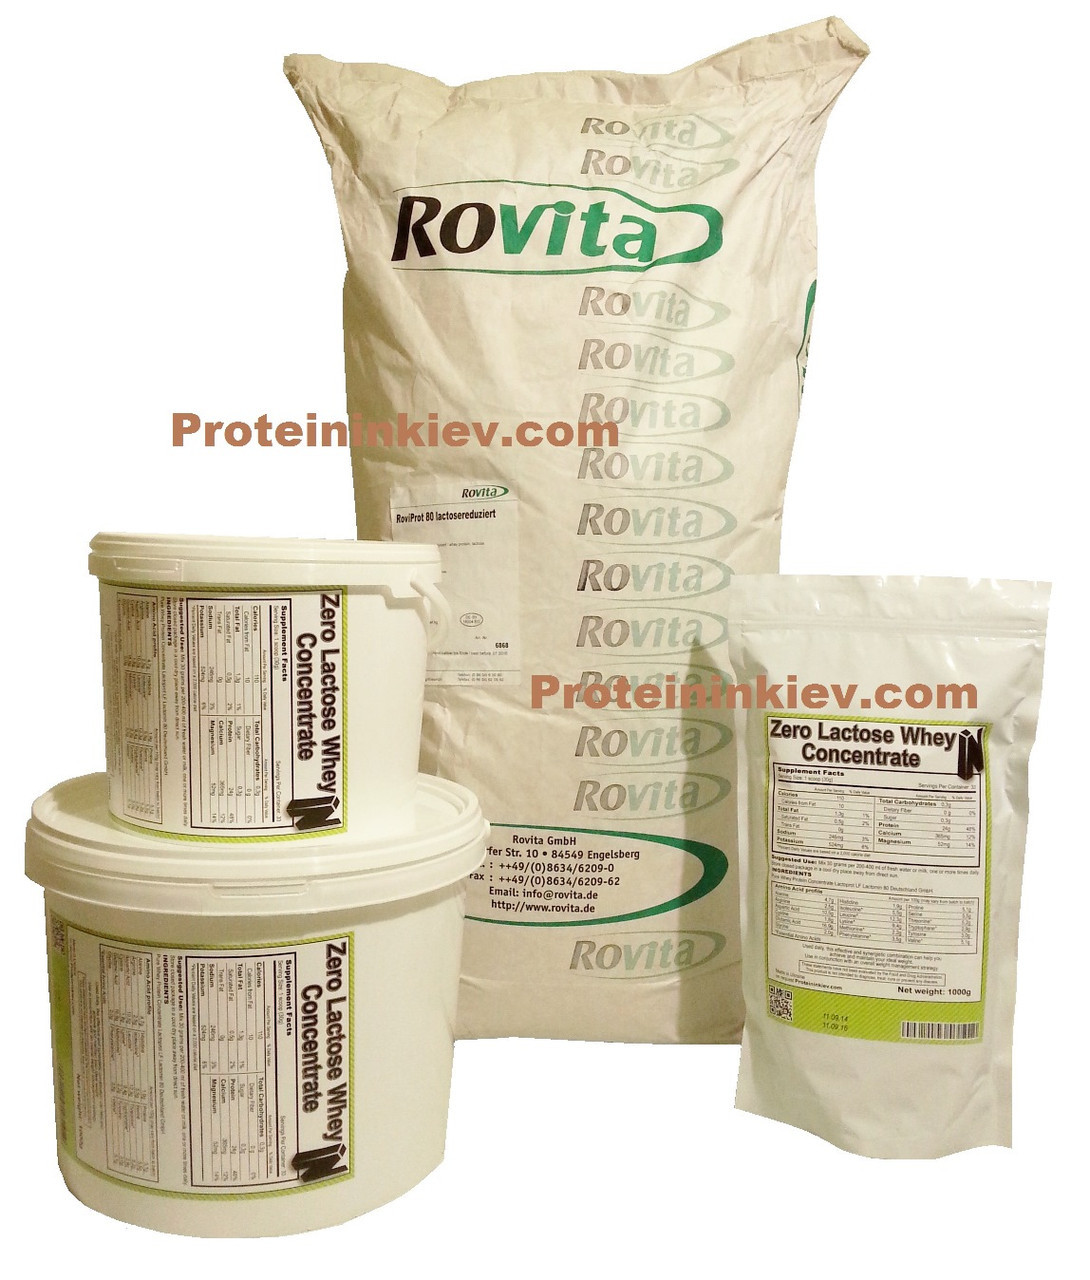 Безлактозный протеин на развес Rovita Roviprot 80 LF (Германия) 20 кг - оптовая цена